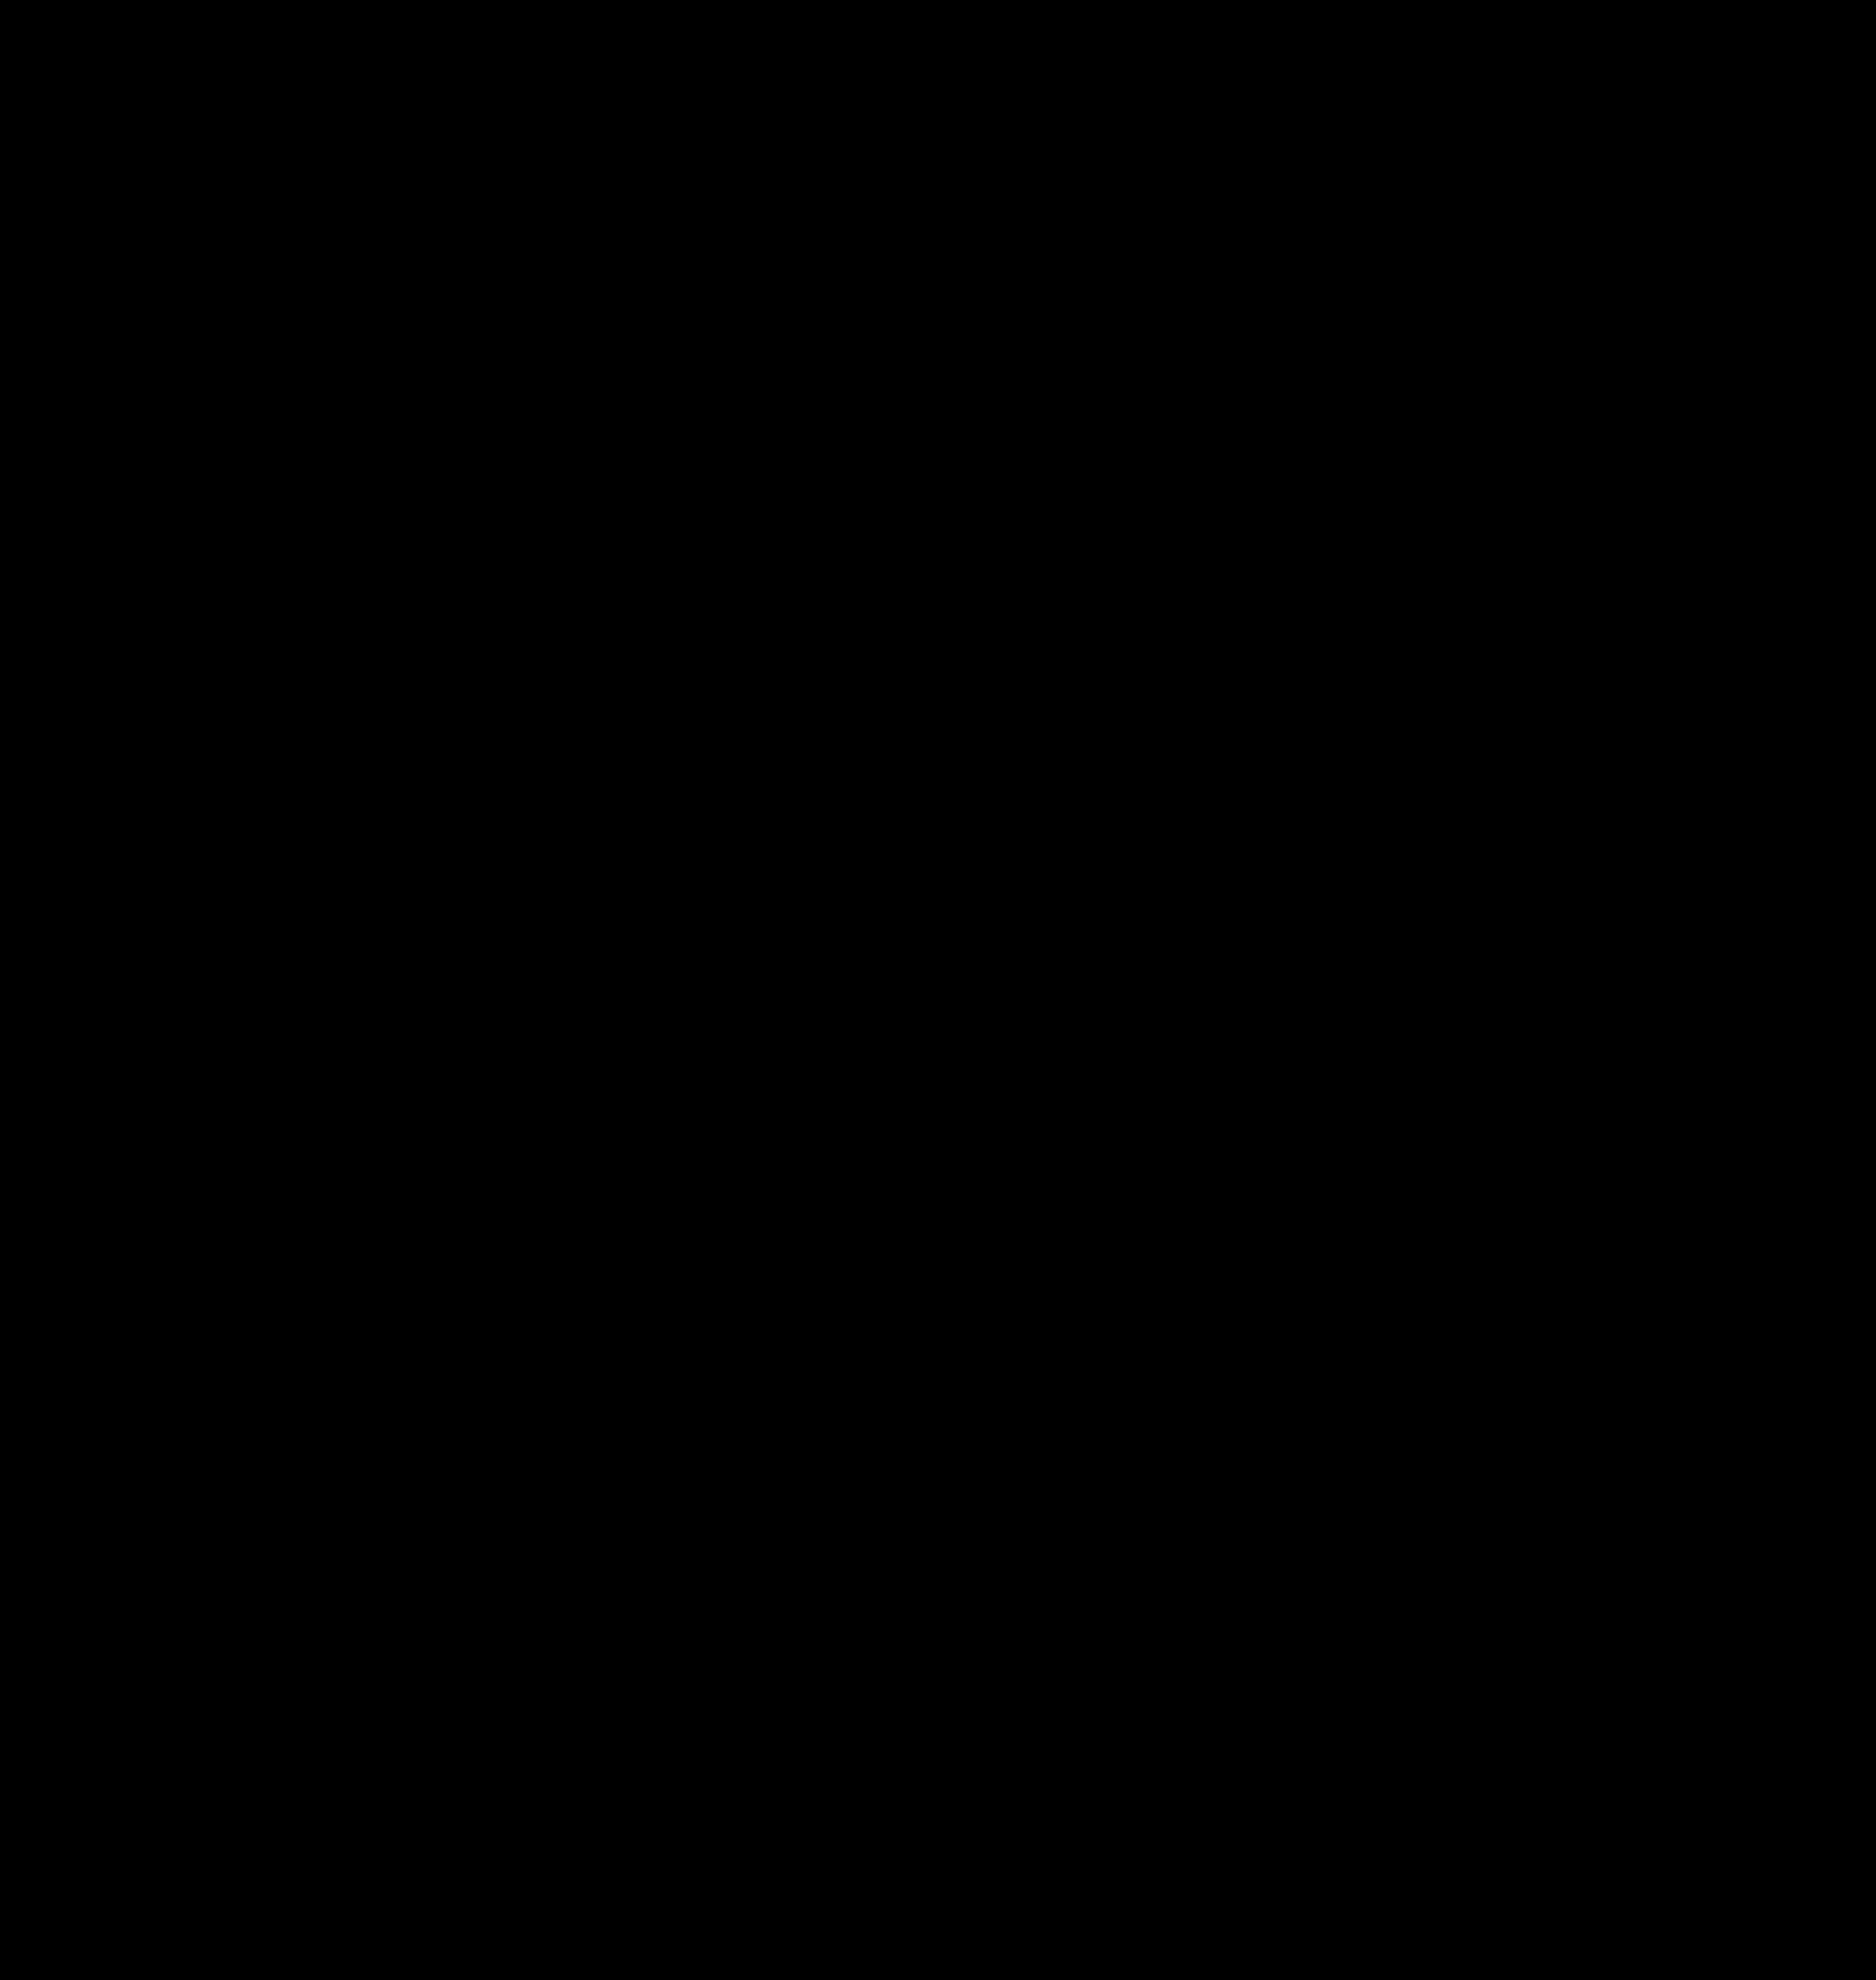 PomaIIIka